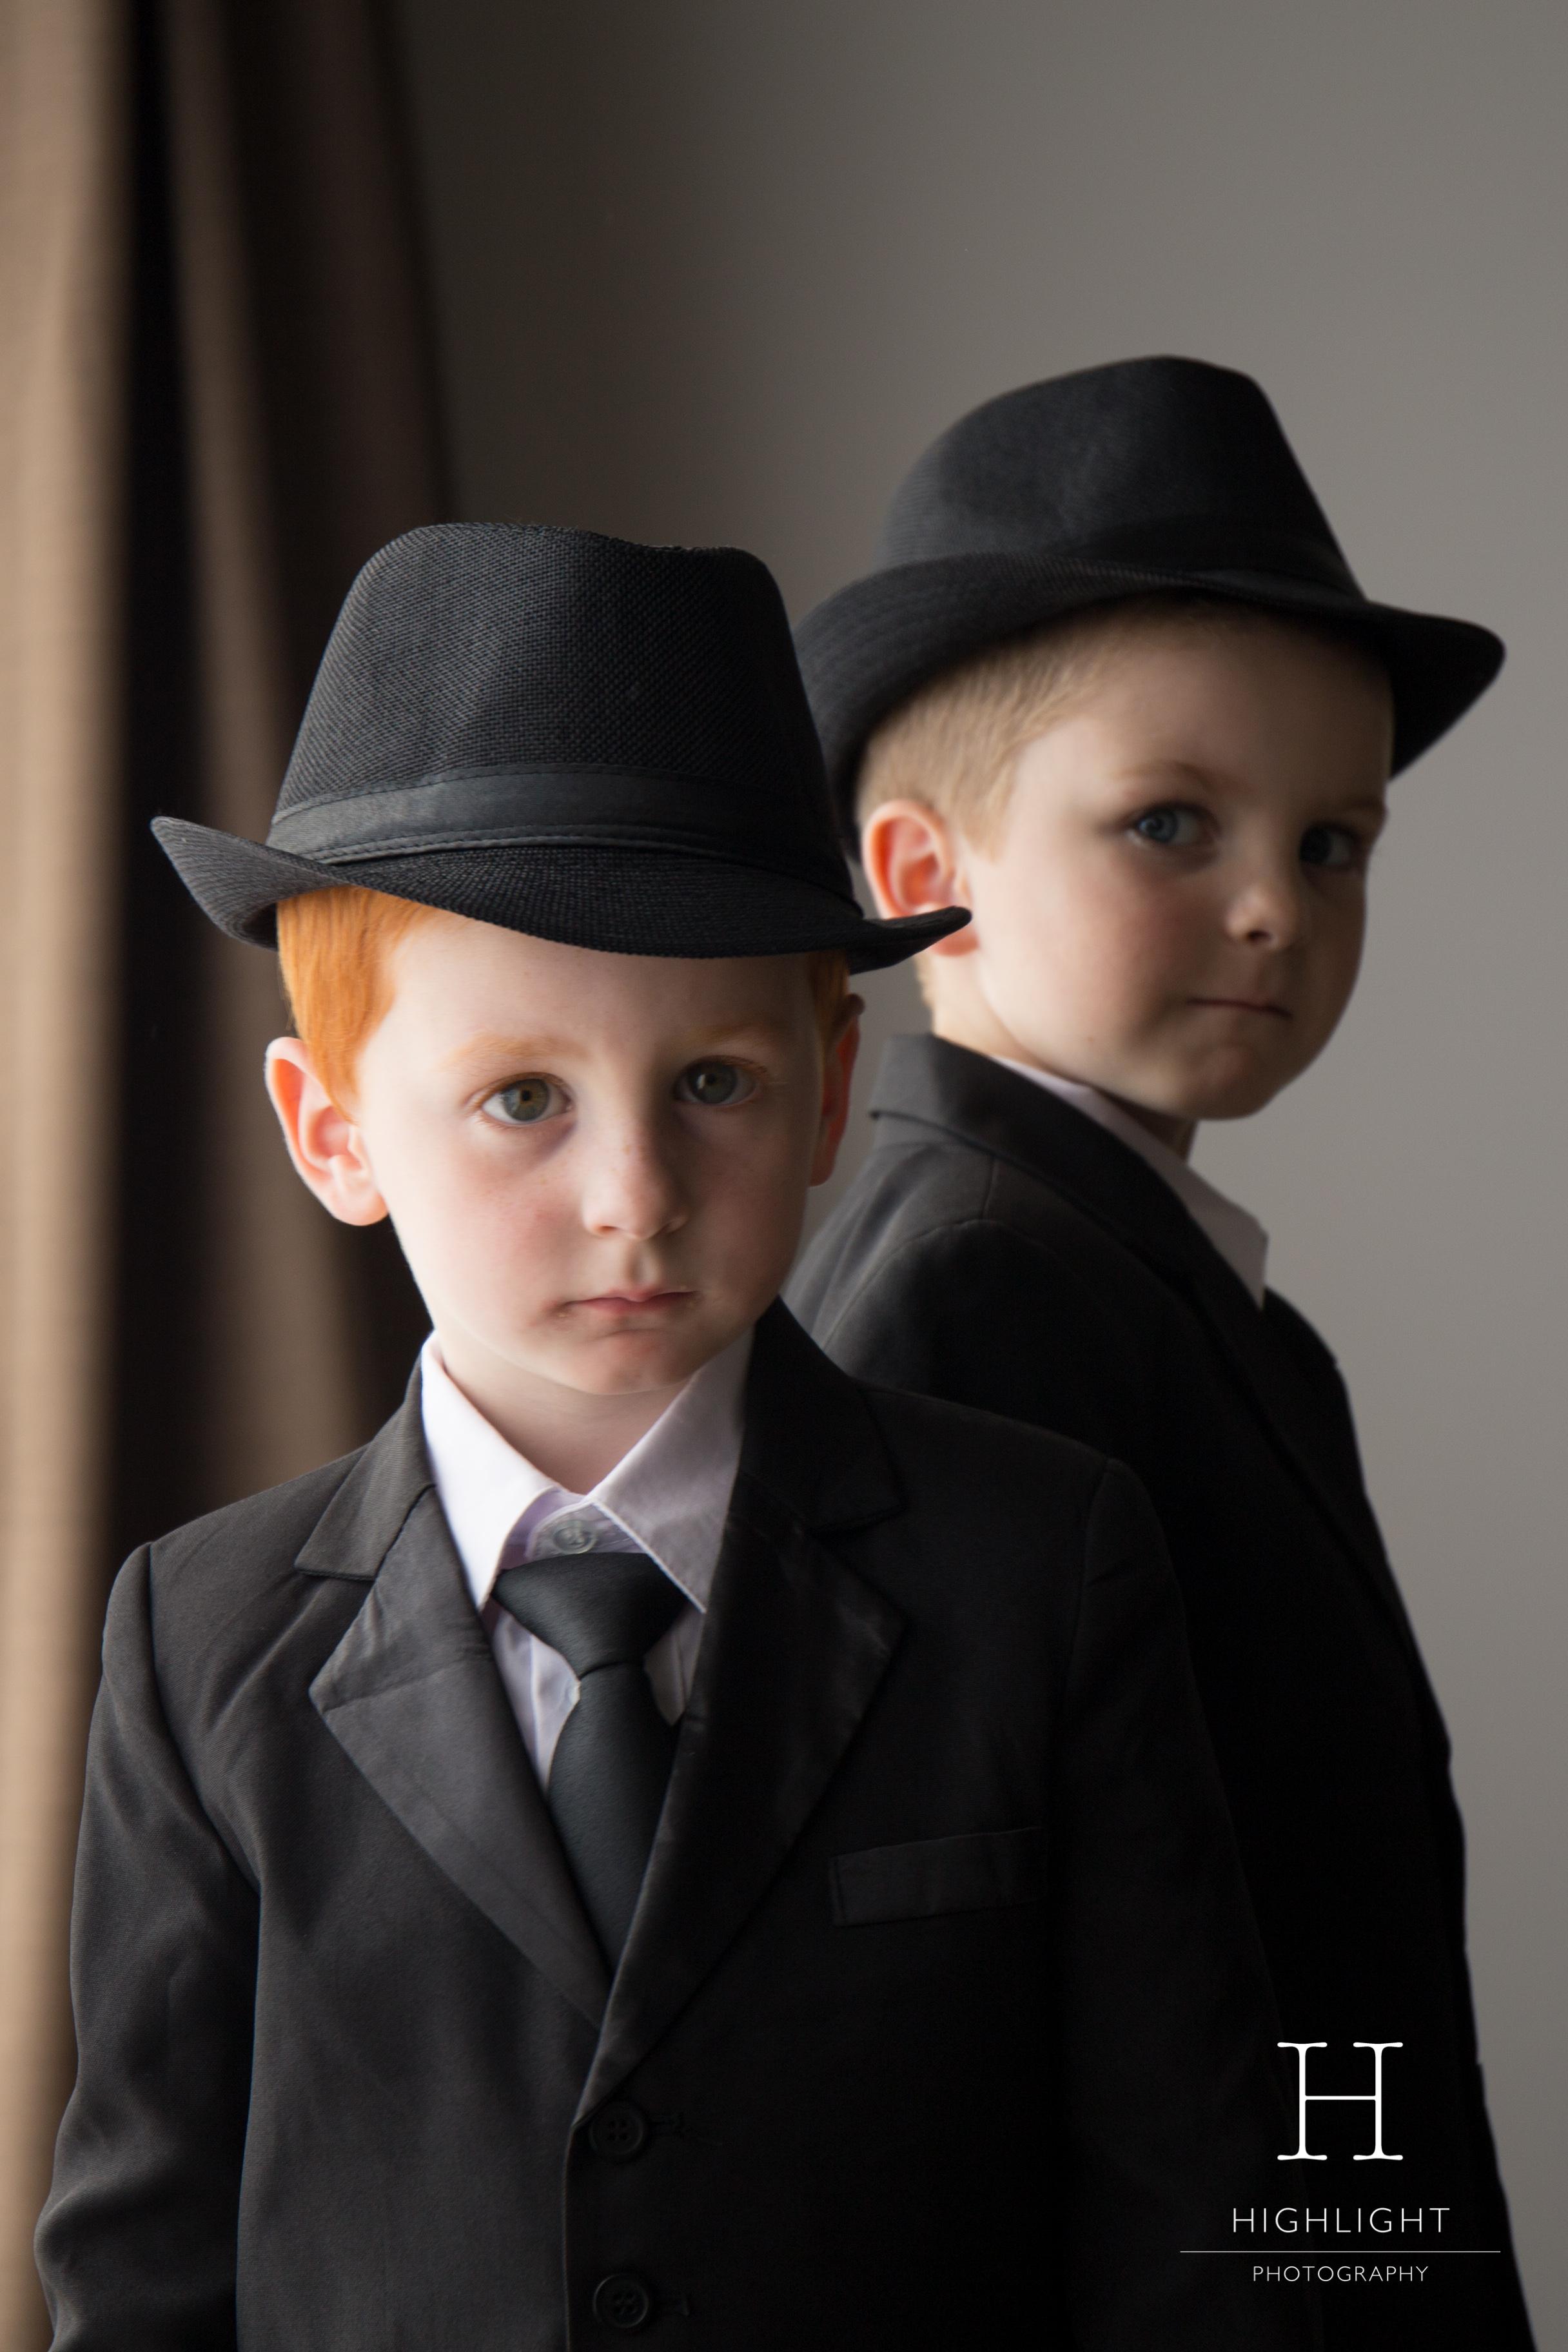 highlight_photography_wedding_new_zealand_kids_hats.jpg